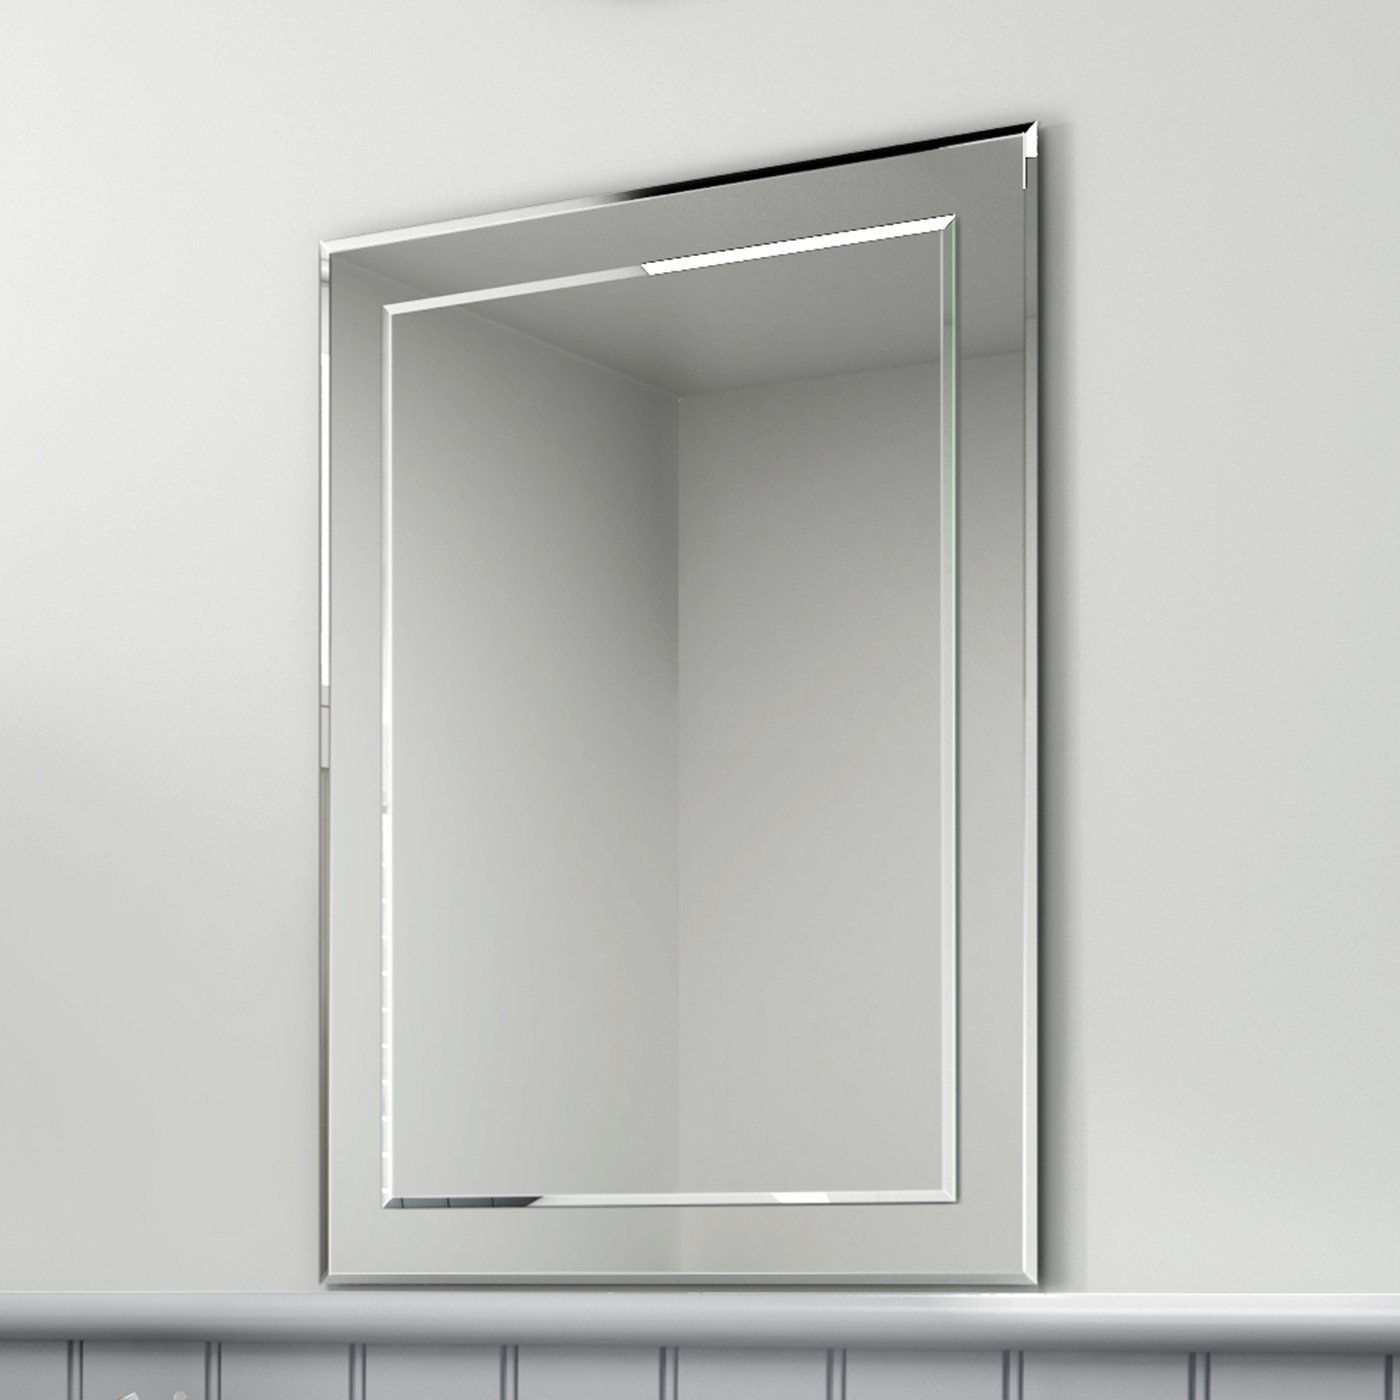 Large bathroom mirror cabinets   Идеи зеркал   Pinterest   Large ...